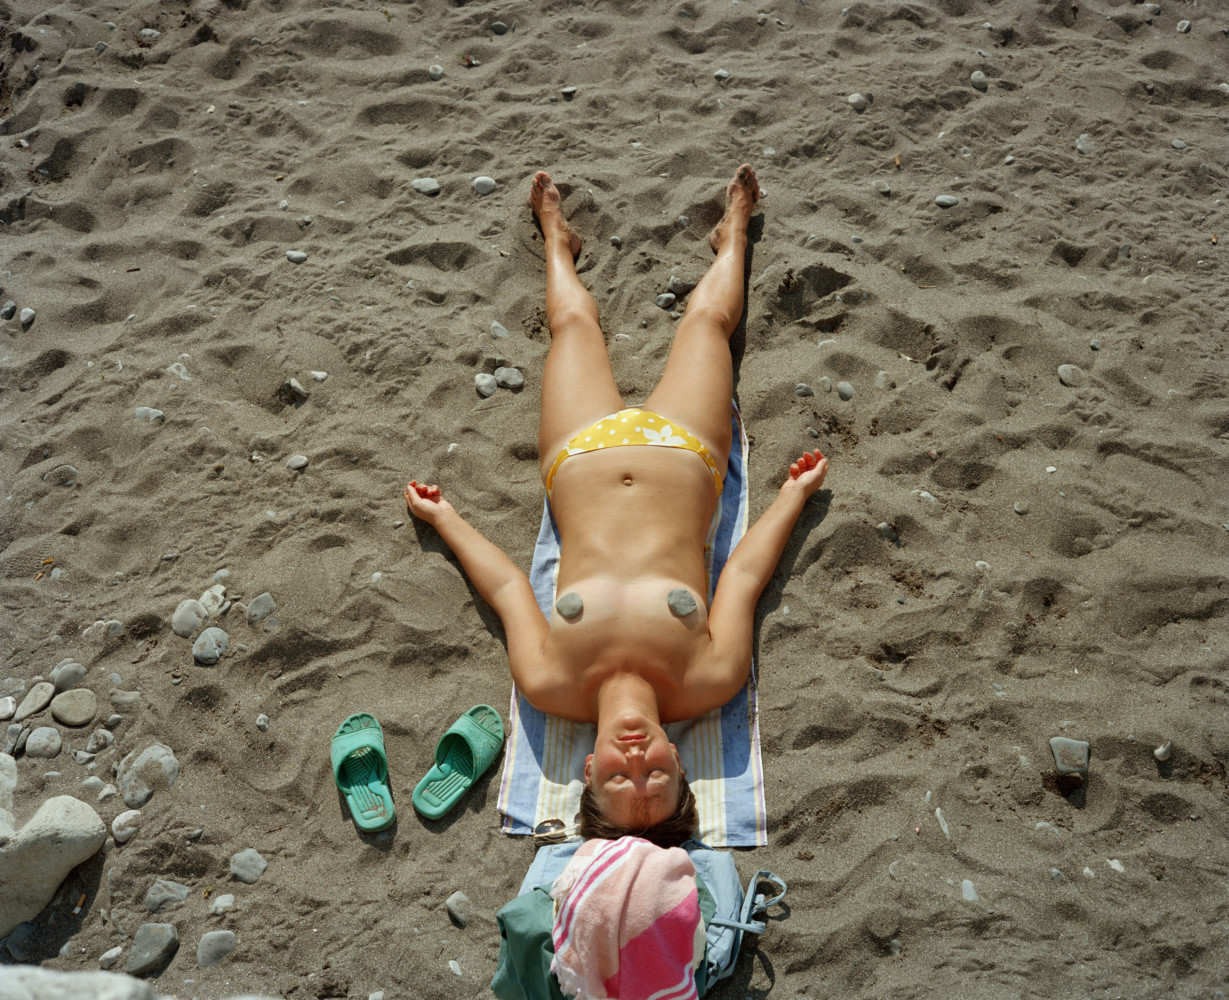 Bikini Flashing and Nude Sunbathing Party Girls on Vacation. - YouPorn